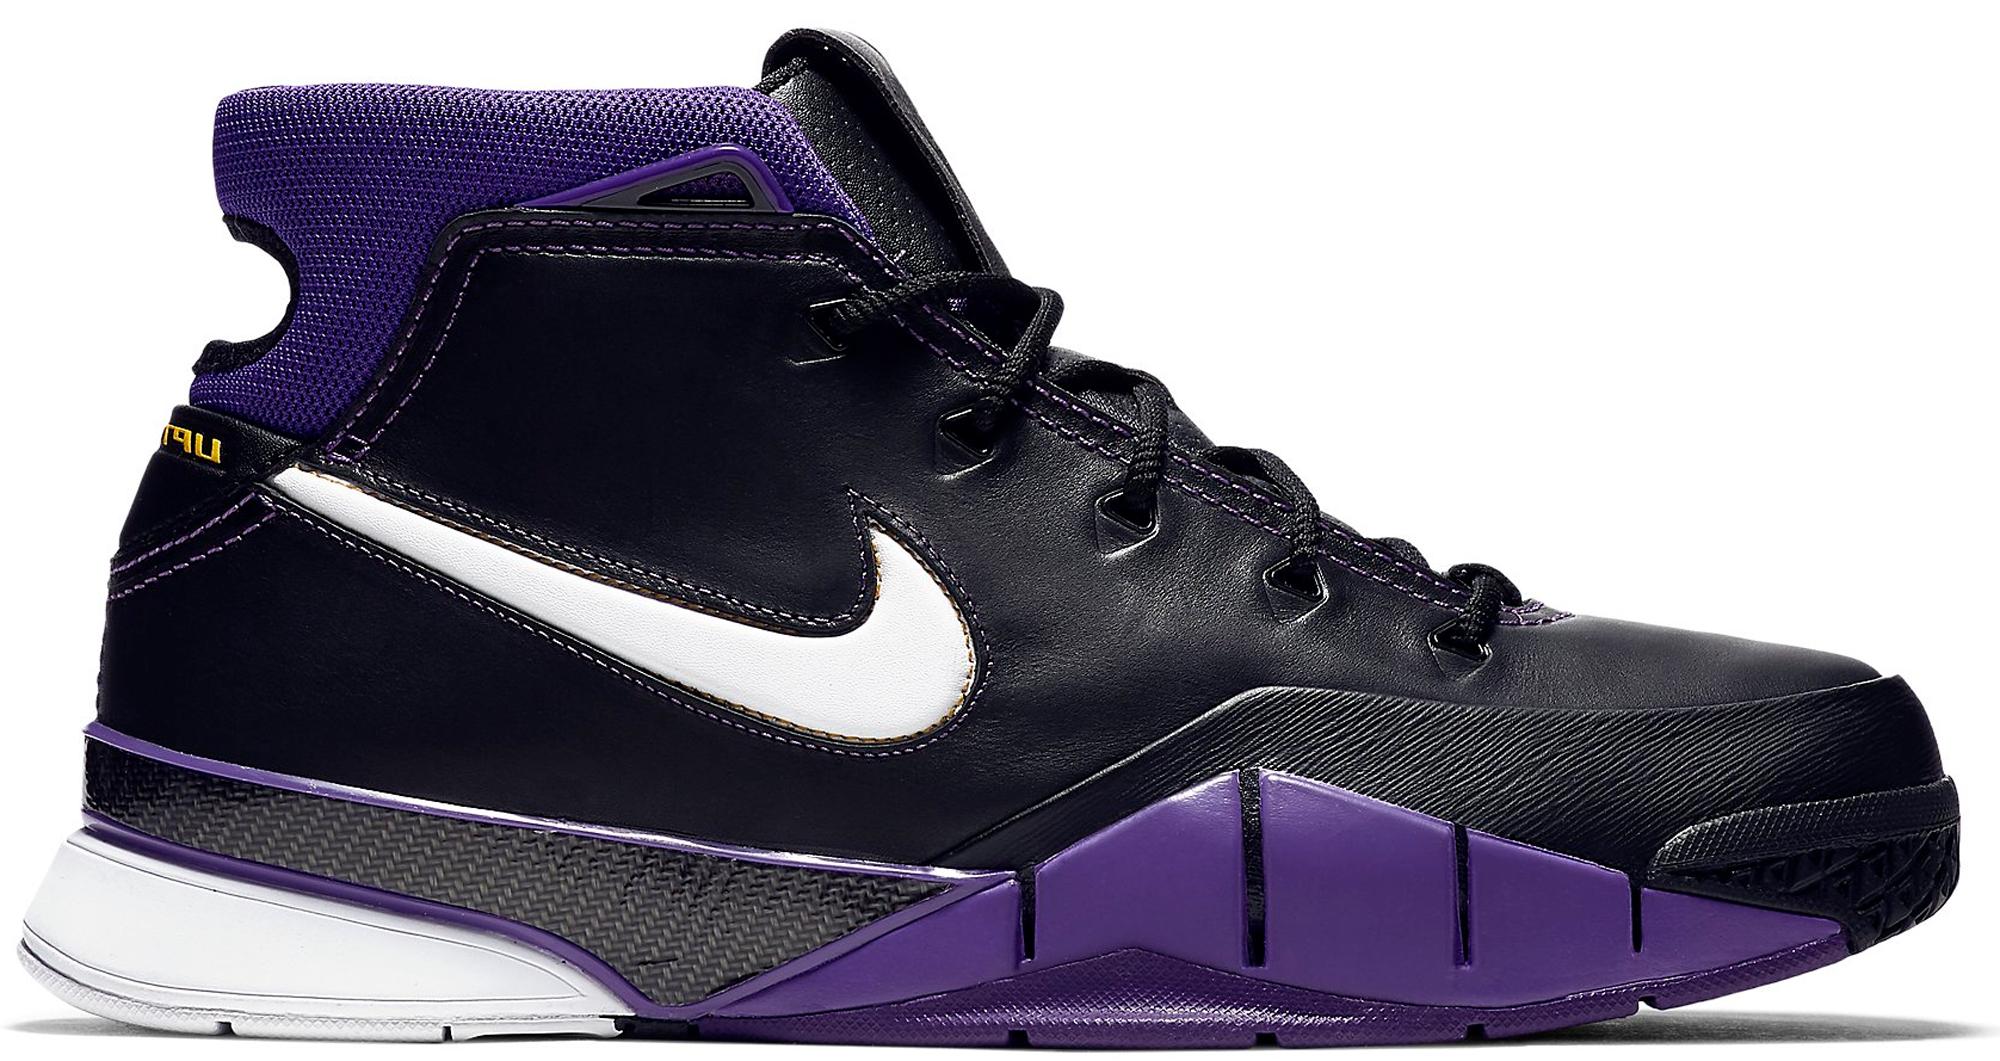 b95274edeb83 ... 9 em low kicksologists ba21d 6af5a  top quality buy nike kobe shoes  deadstock sneakers 2f283 8d8de